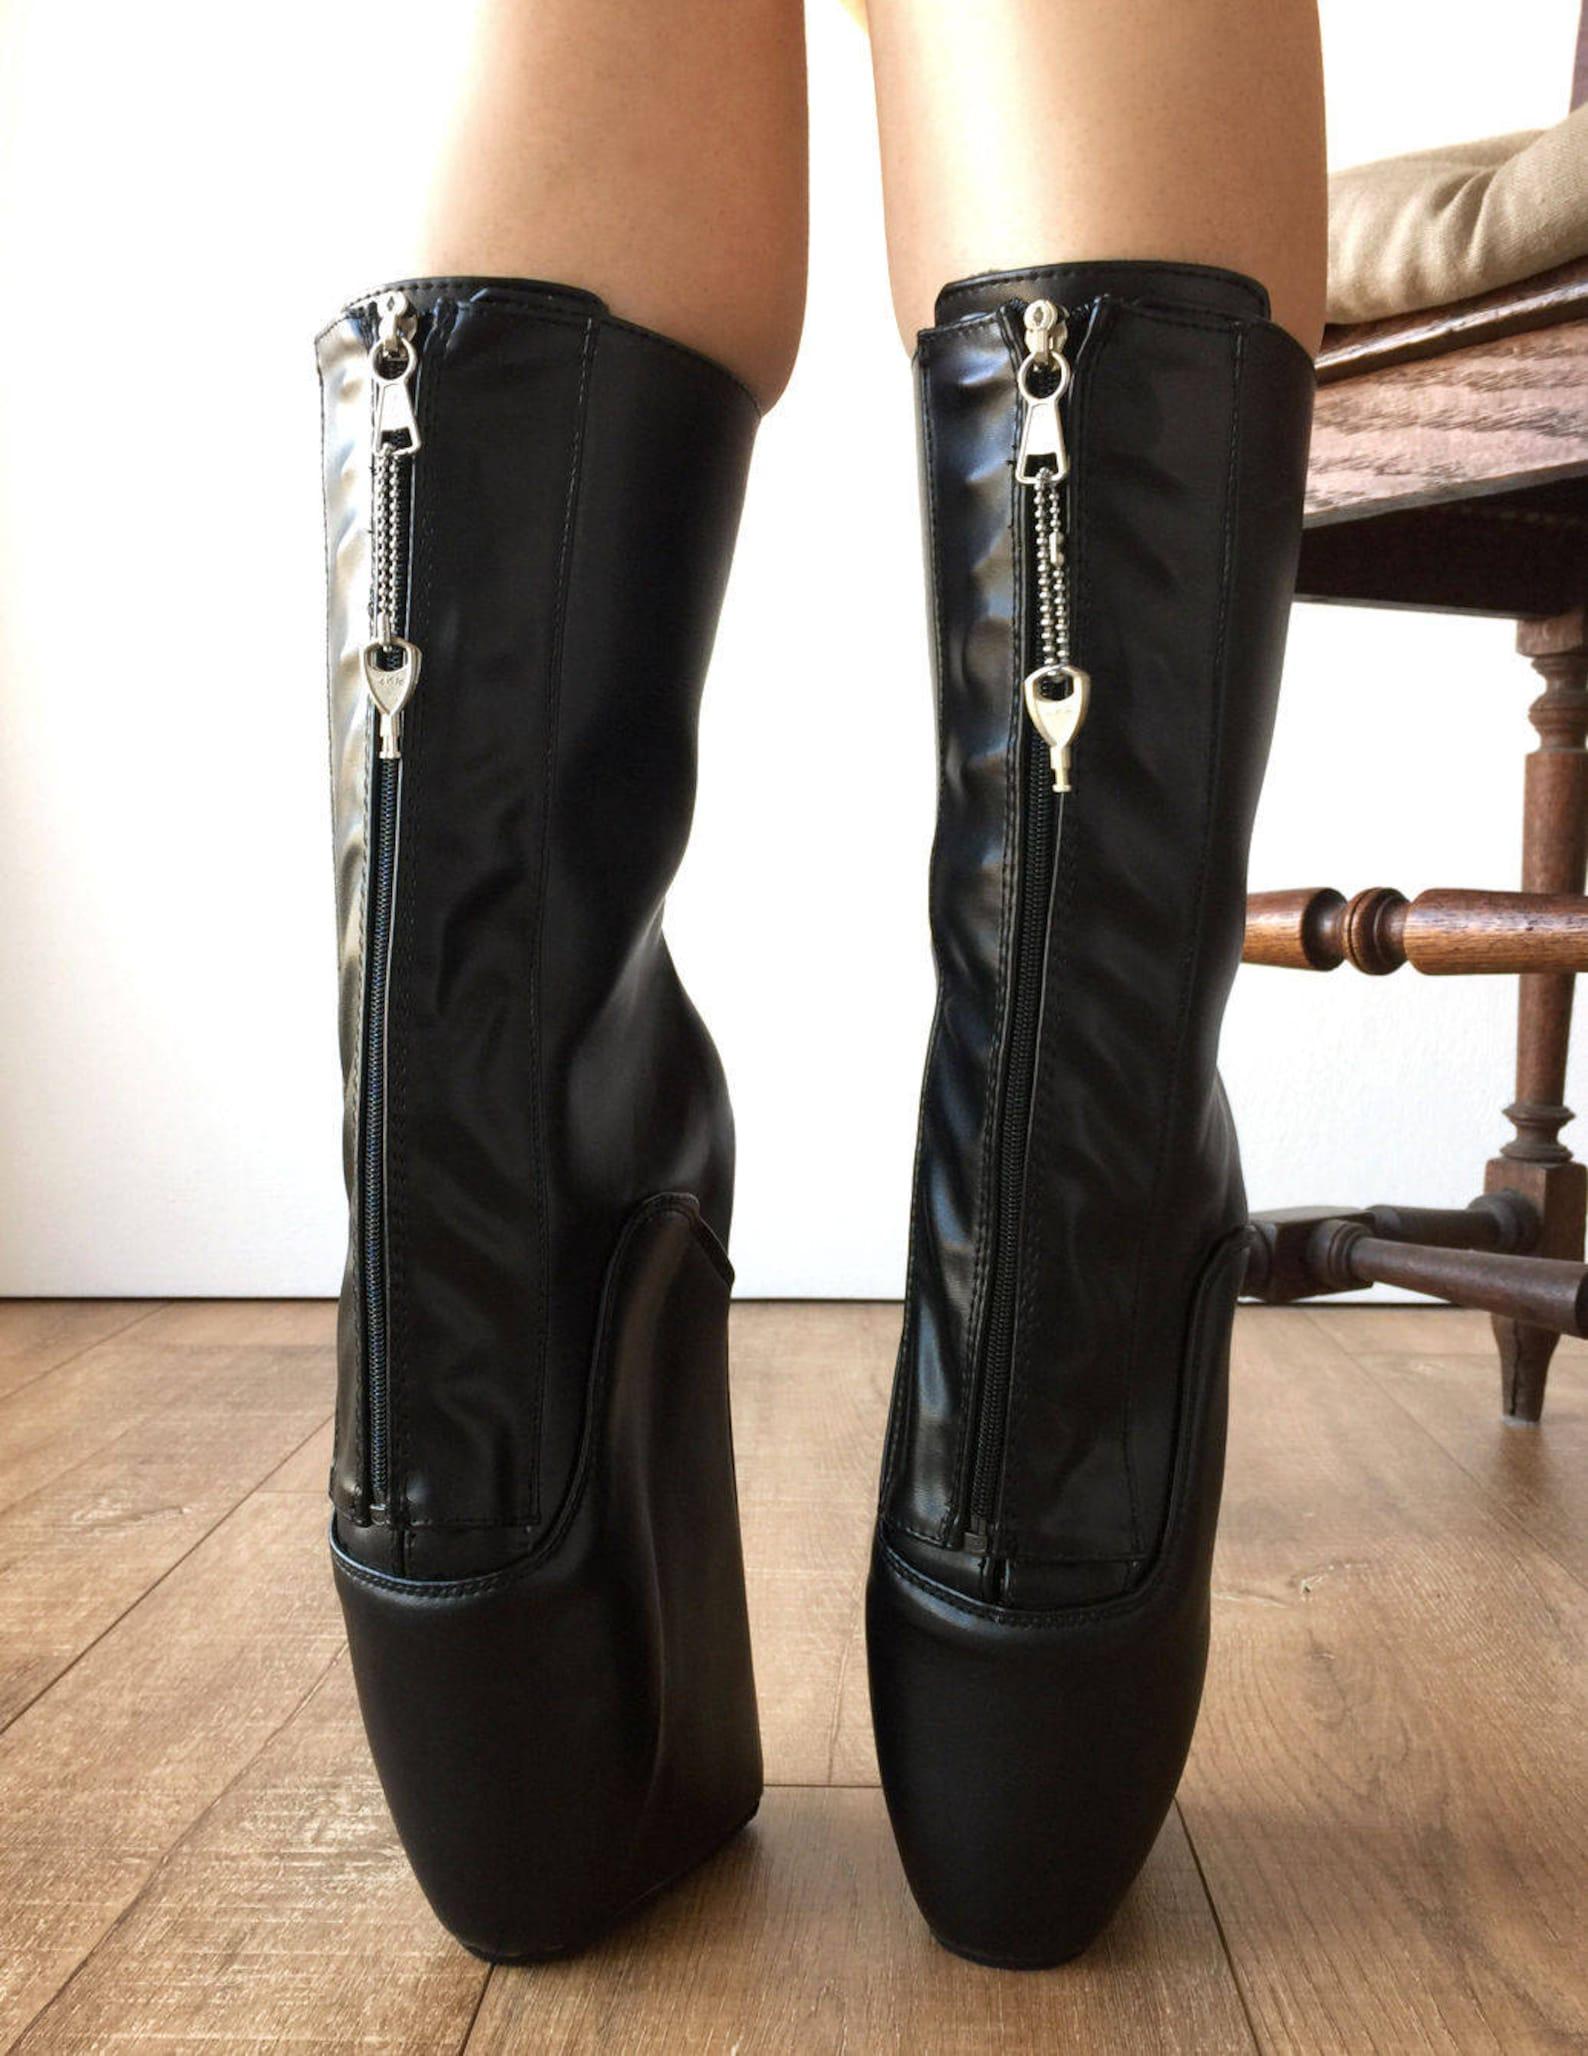 keep calf ballet wedge boots ykk zip lockable hoof heelless fetish pinup rtbu